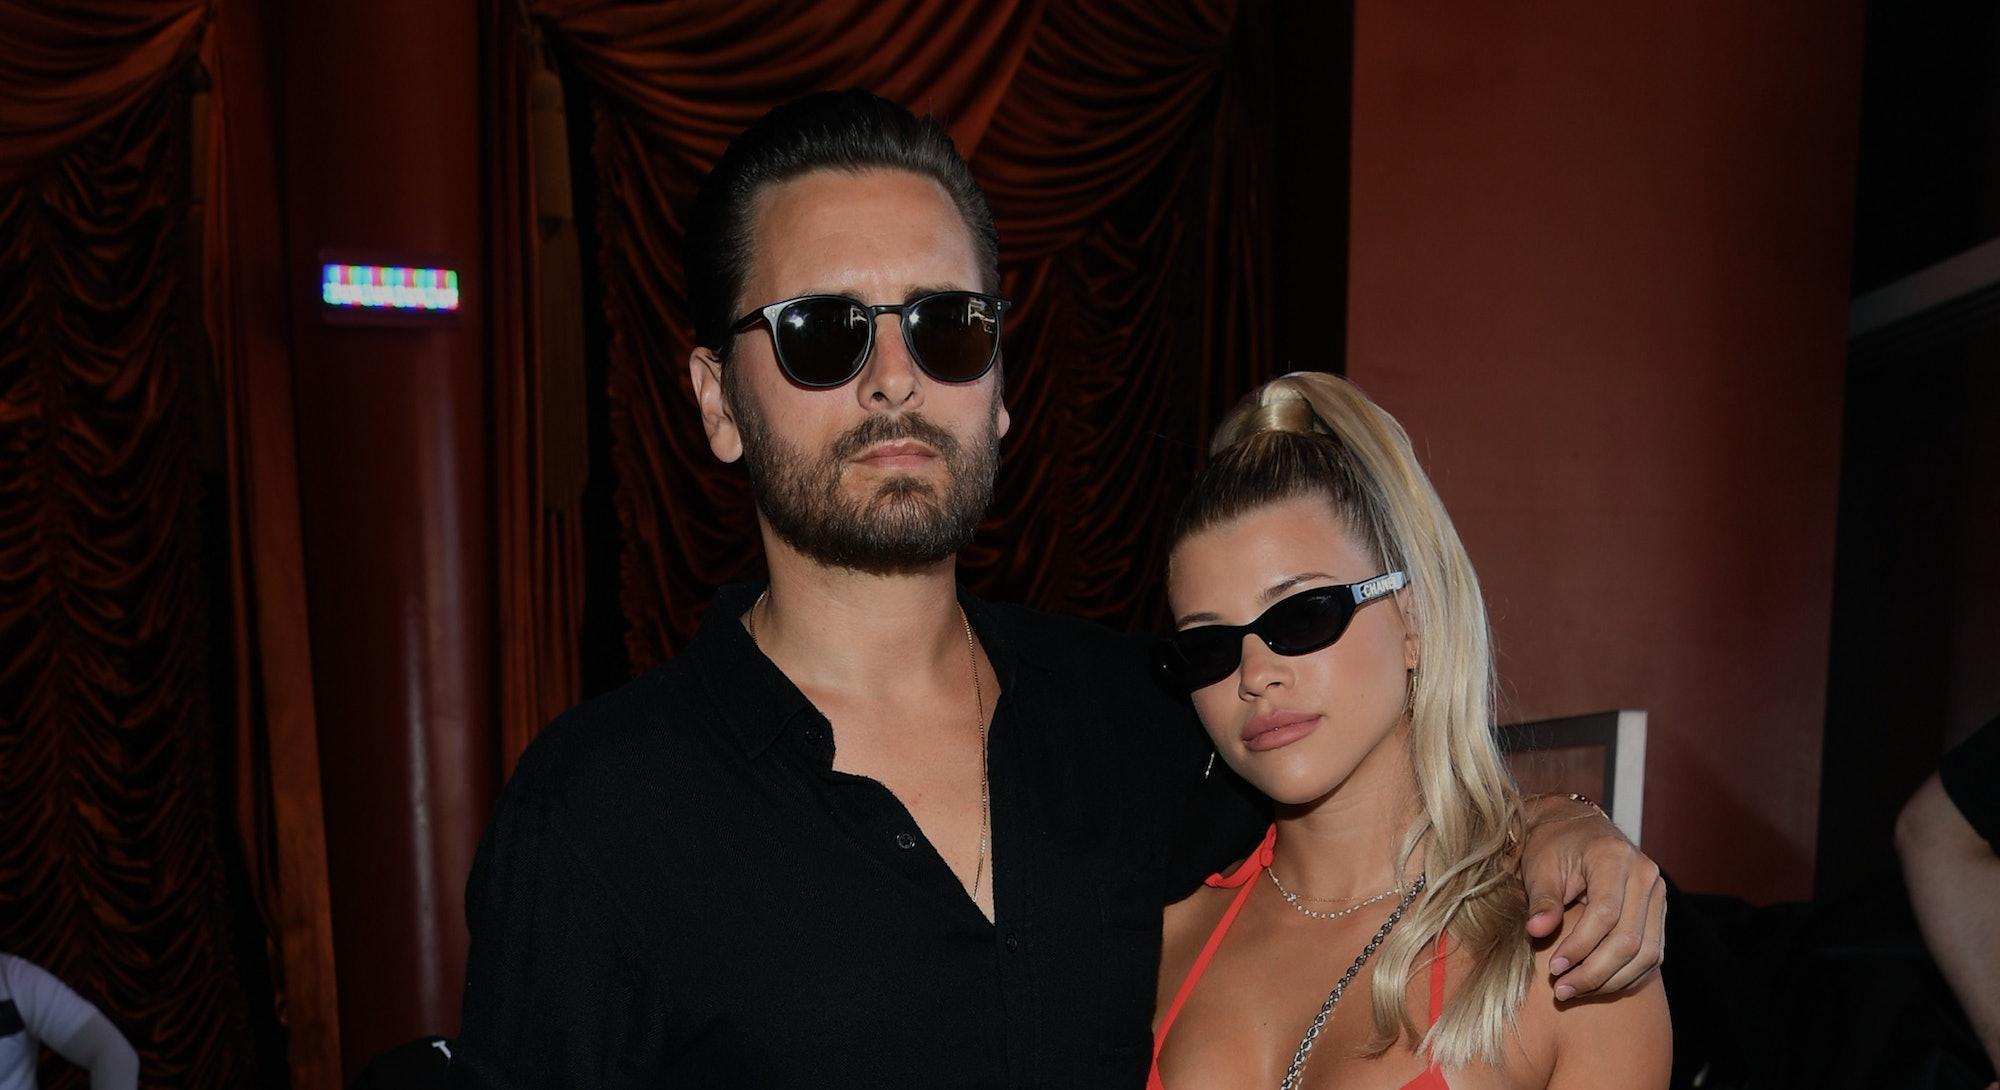 LAS VEGAS, NEVADA - AUGUST 24: Scott Disick and Sofia Richie celebrate Sofia Richie's 21st birthday ...